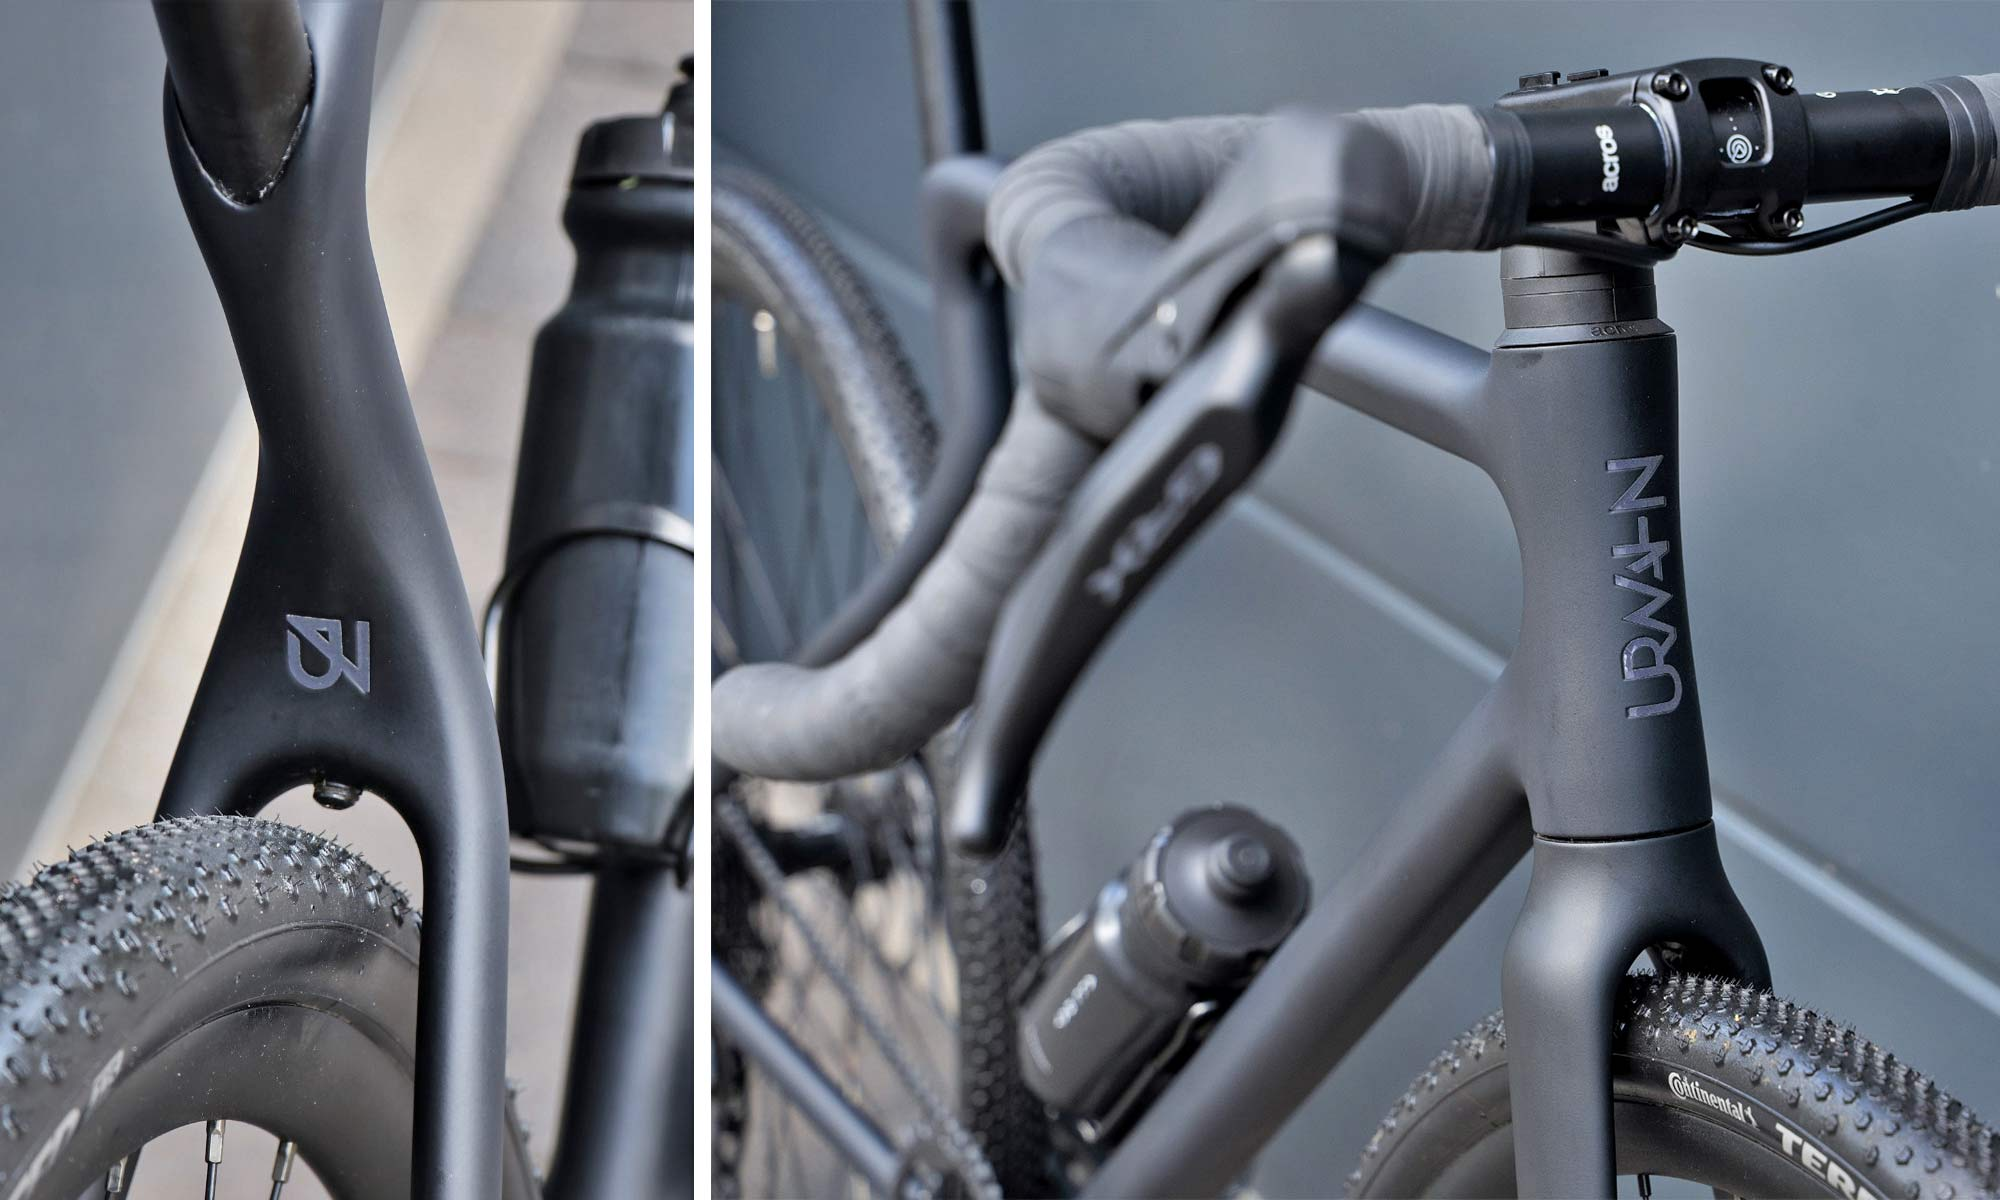 Urwahn Waldwiesel 3D-printed steel gravel bike no seattube, plus Waldwiesel.E hidden e-bike option, frame details